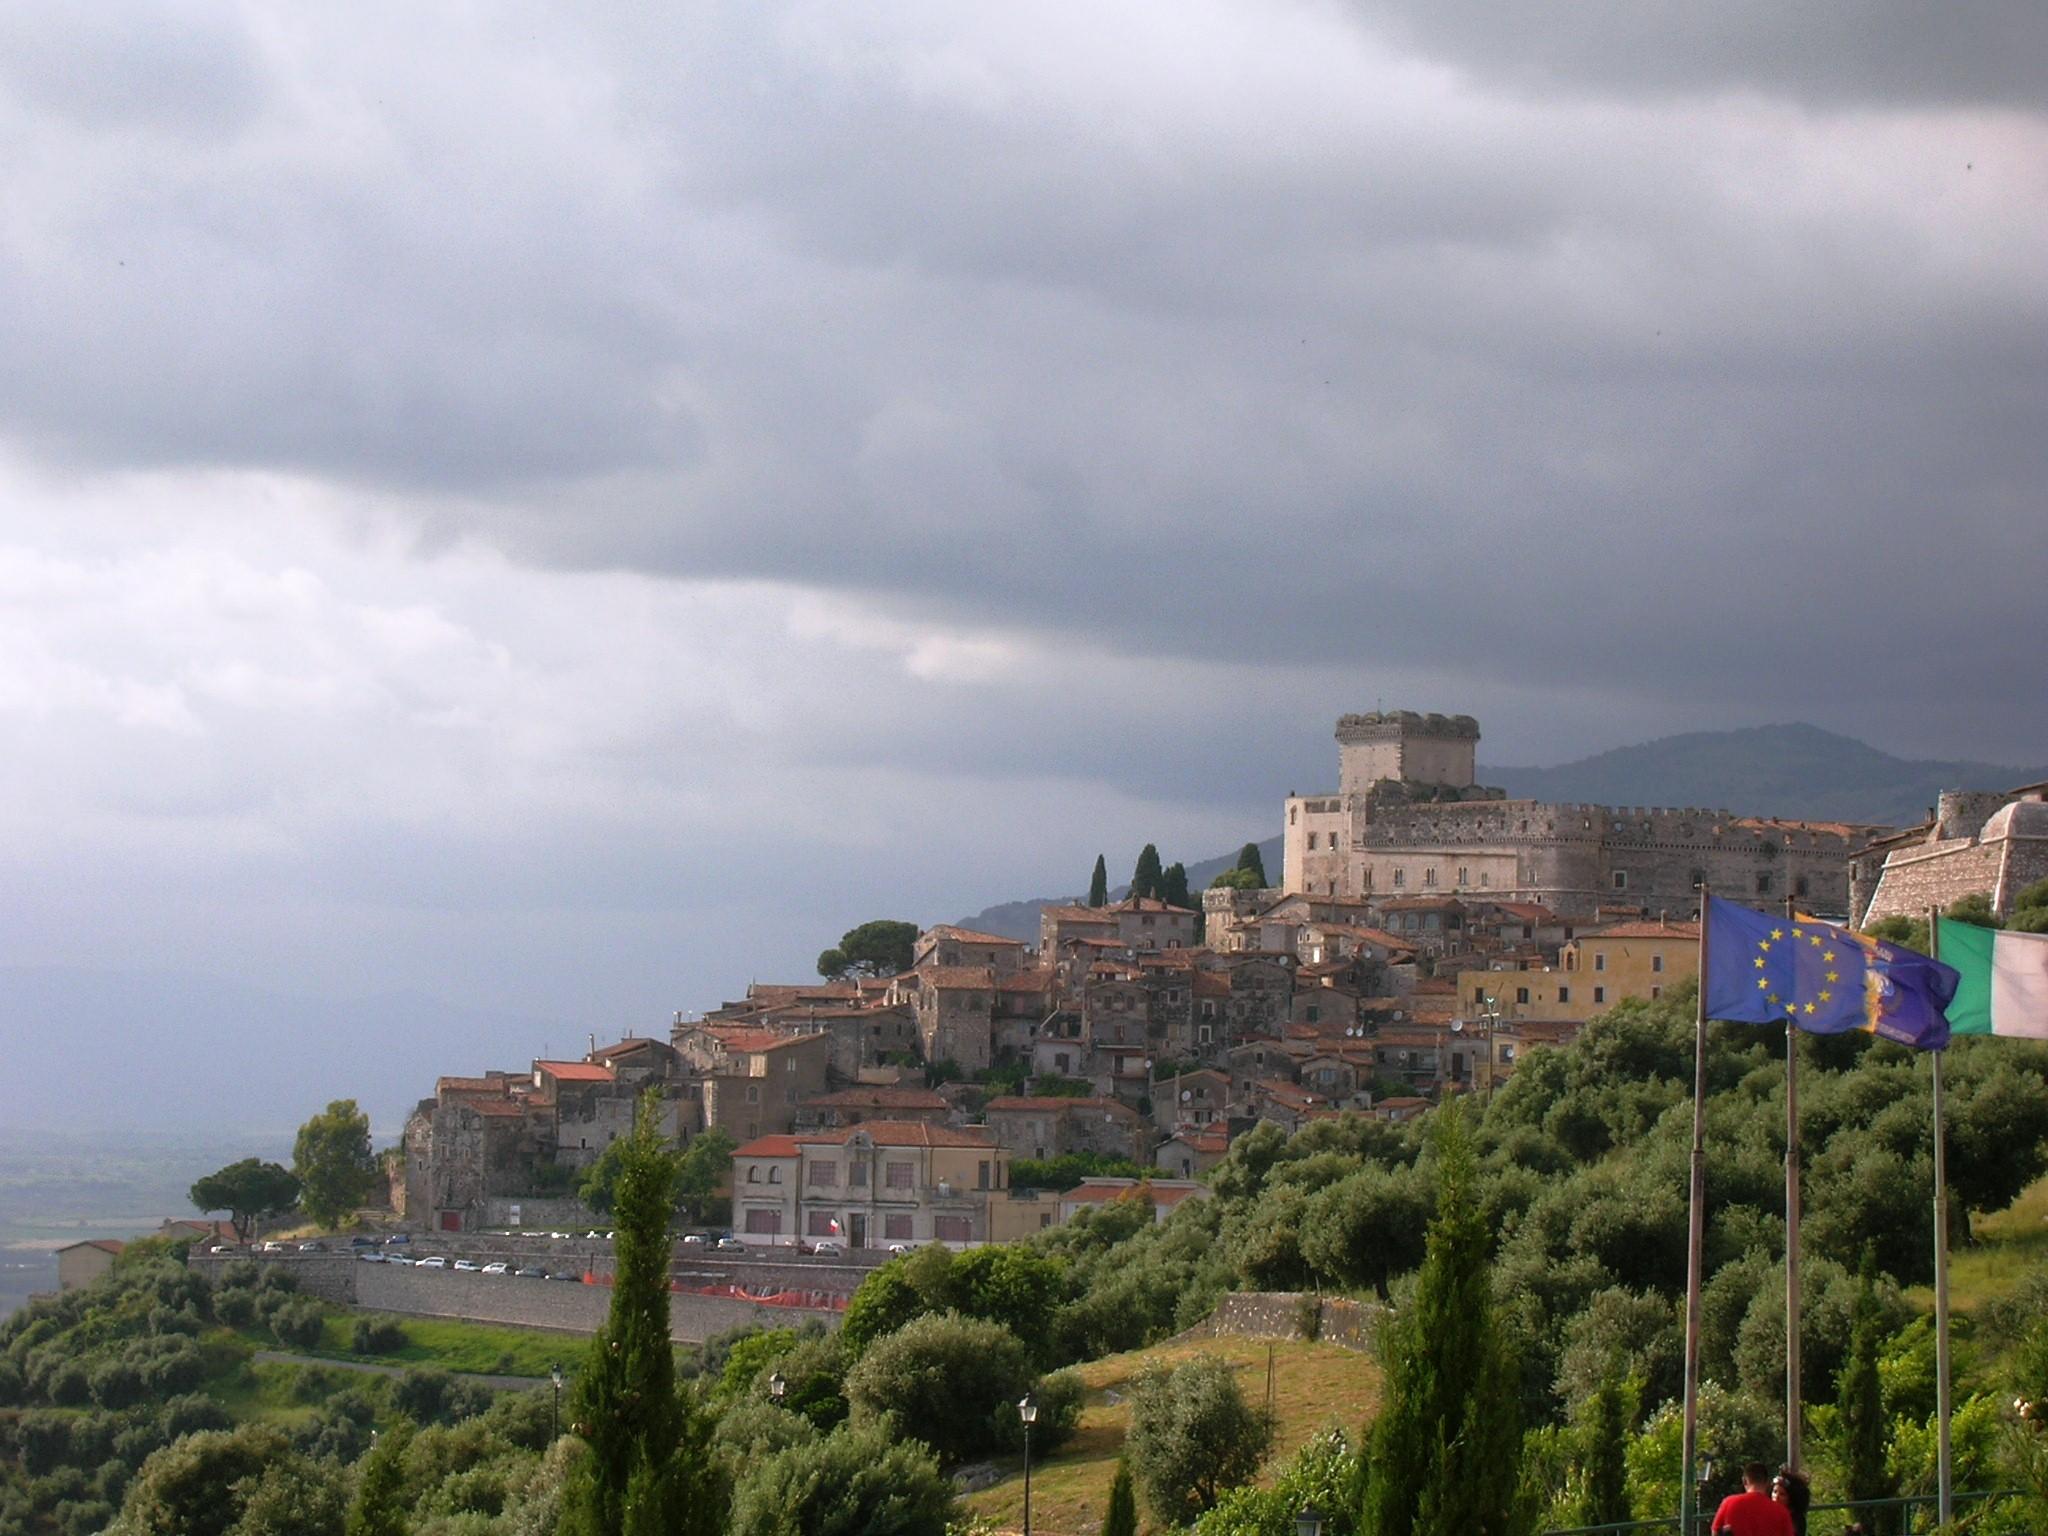 Sermoneta mit dem Castello Caetani